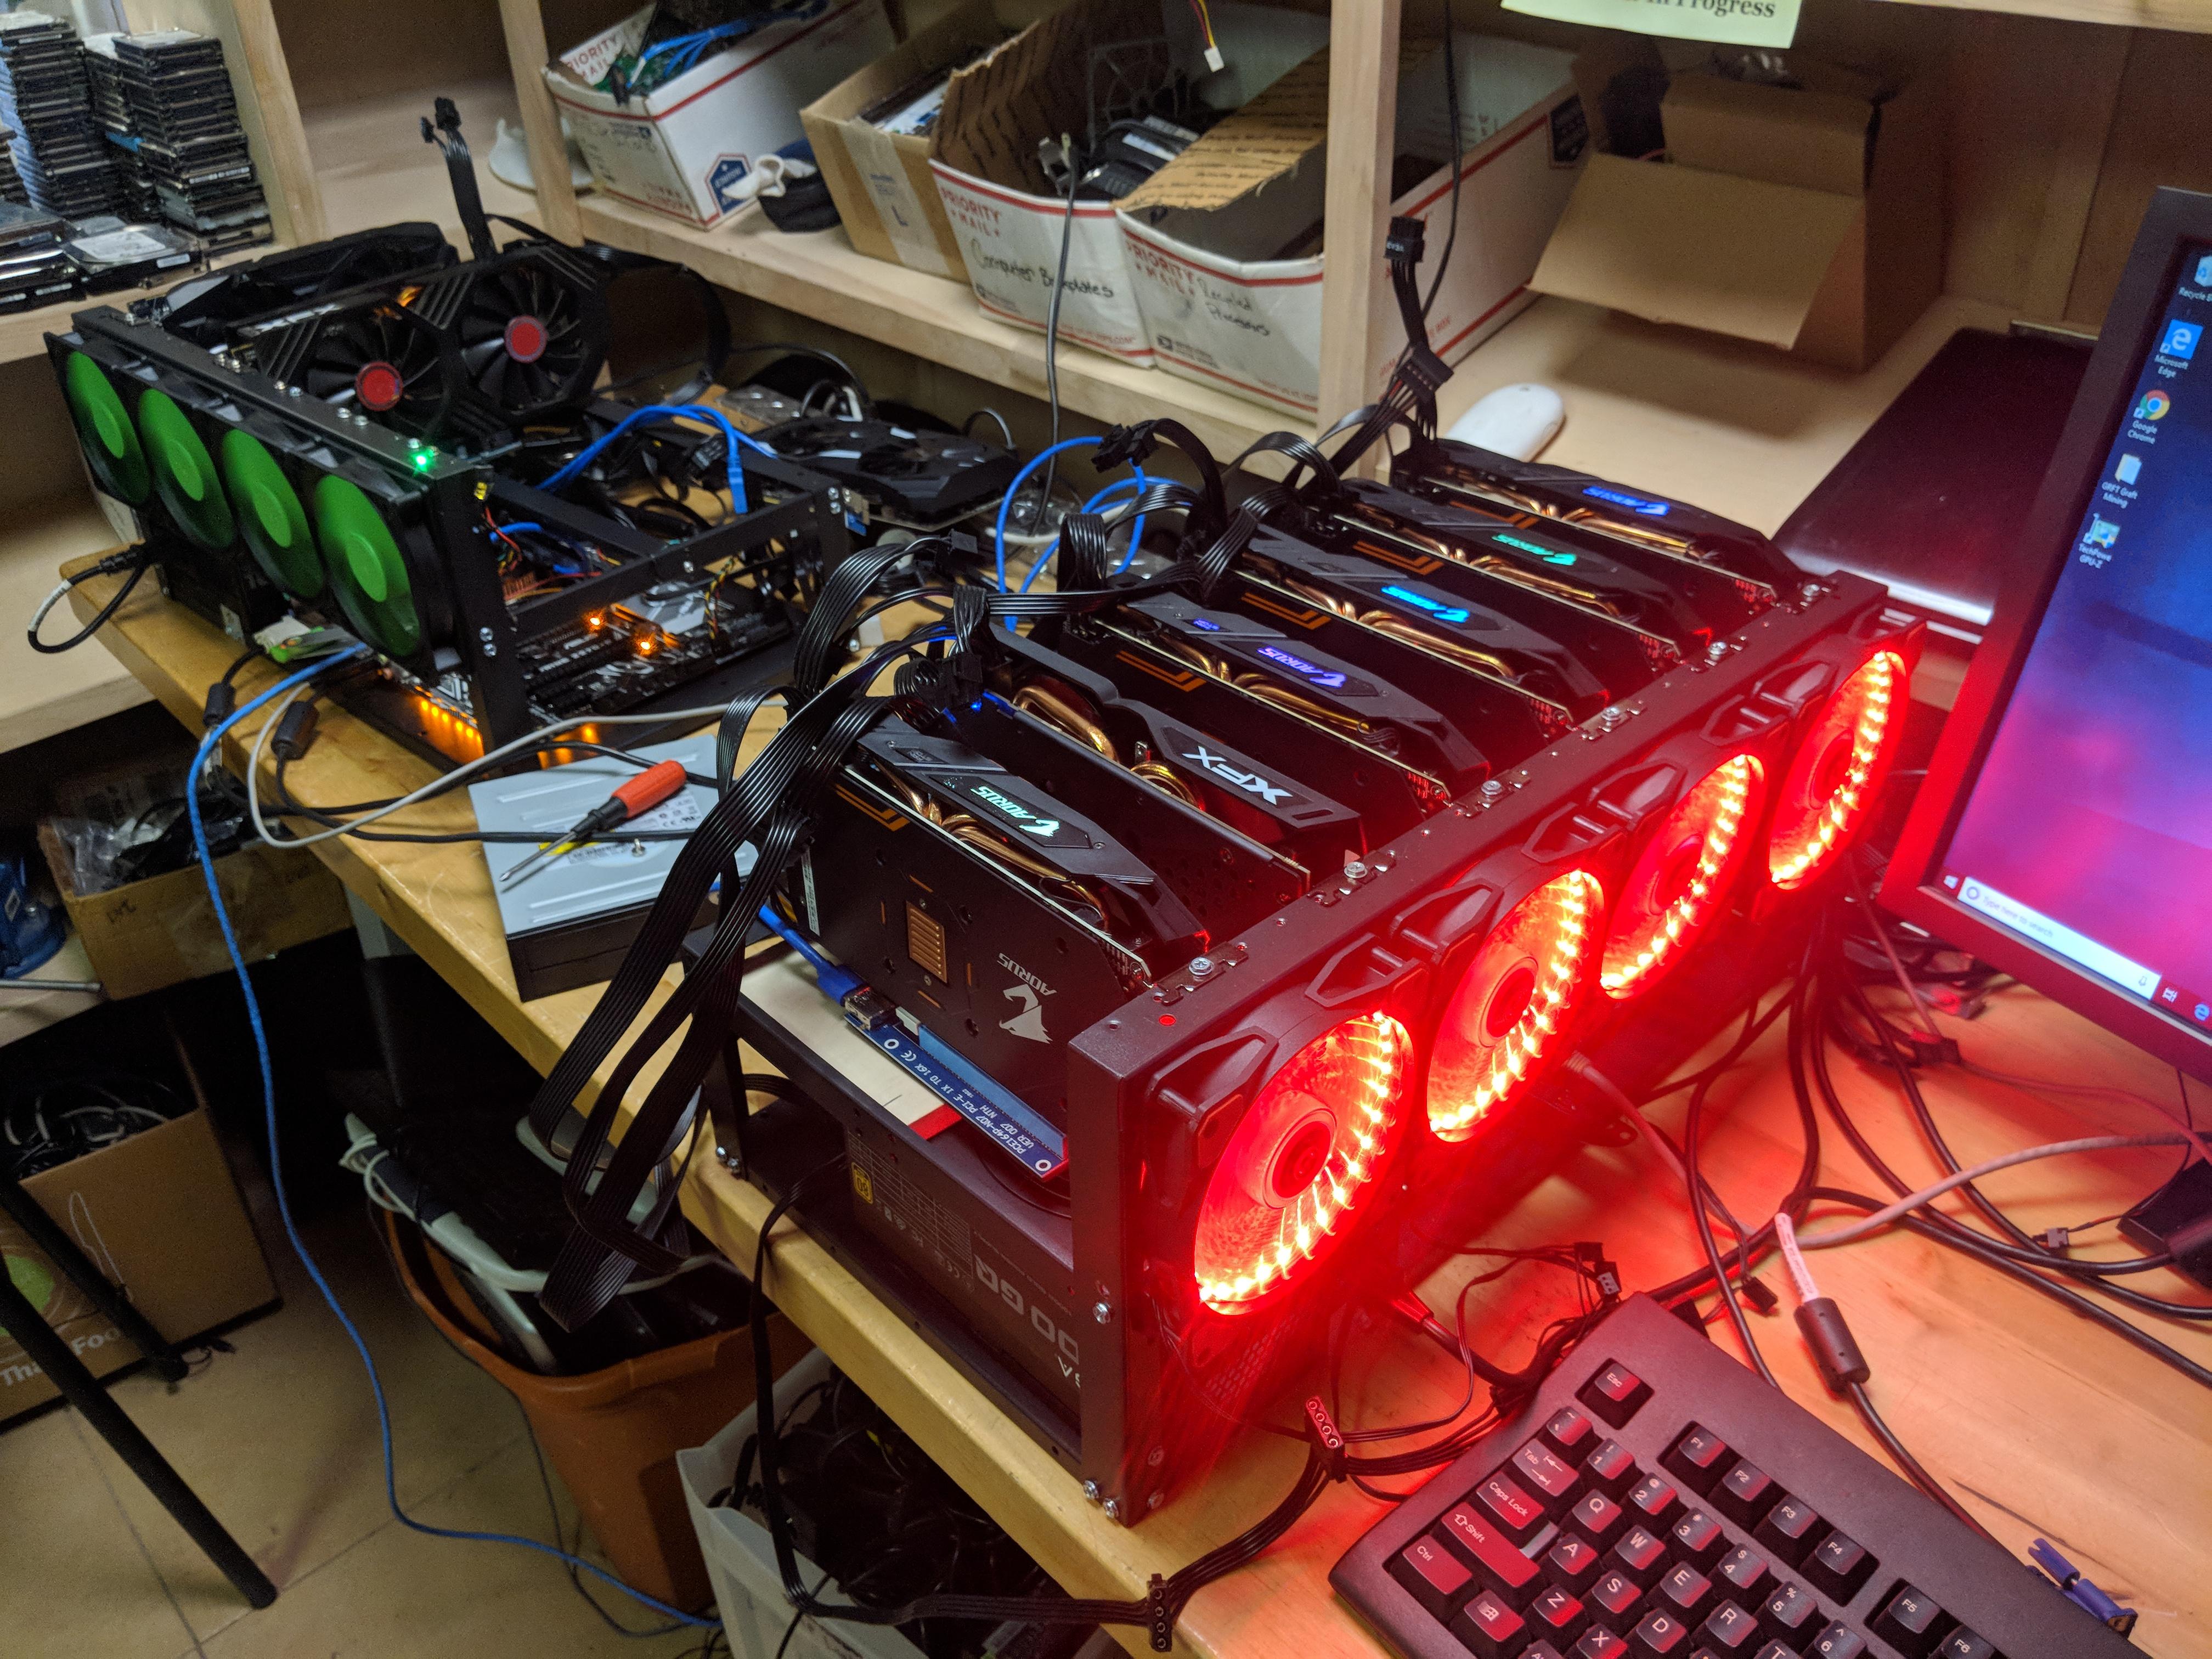 Prescott Valley, AZ Building GPU Mining Rig RX 570 6x Rig